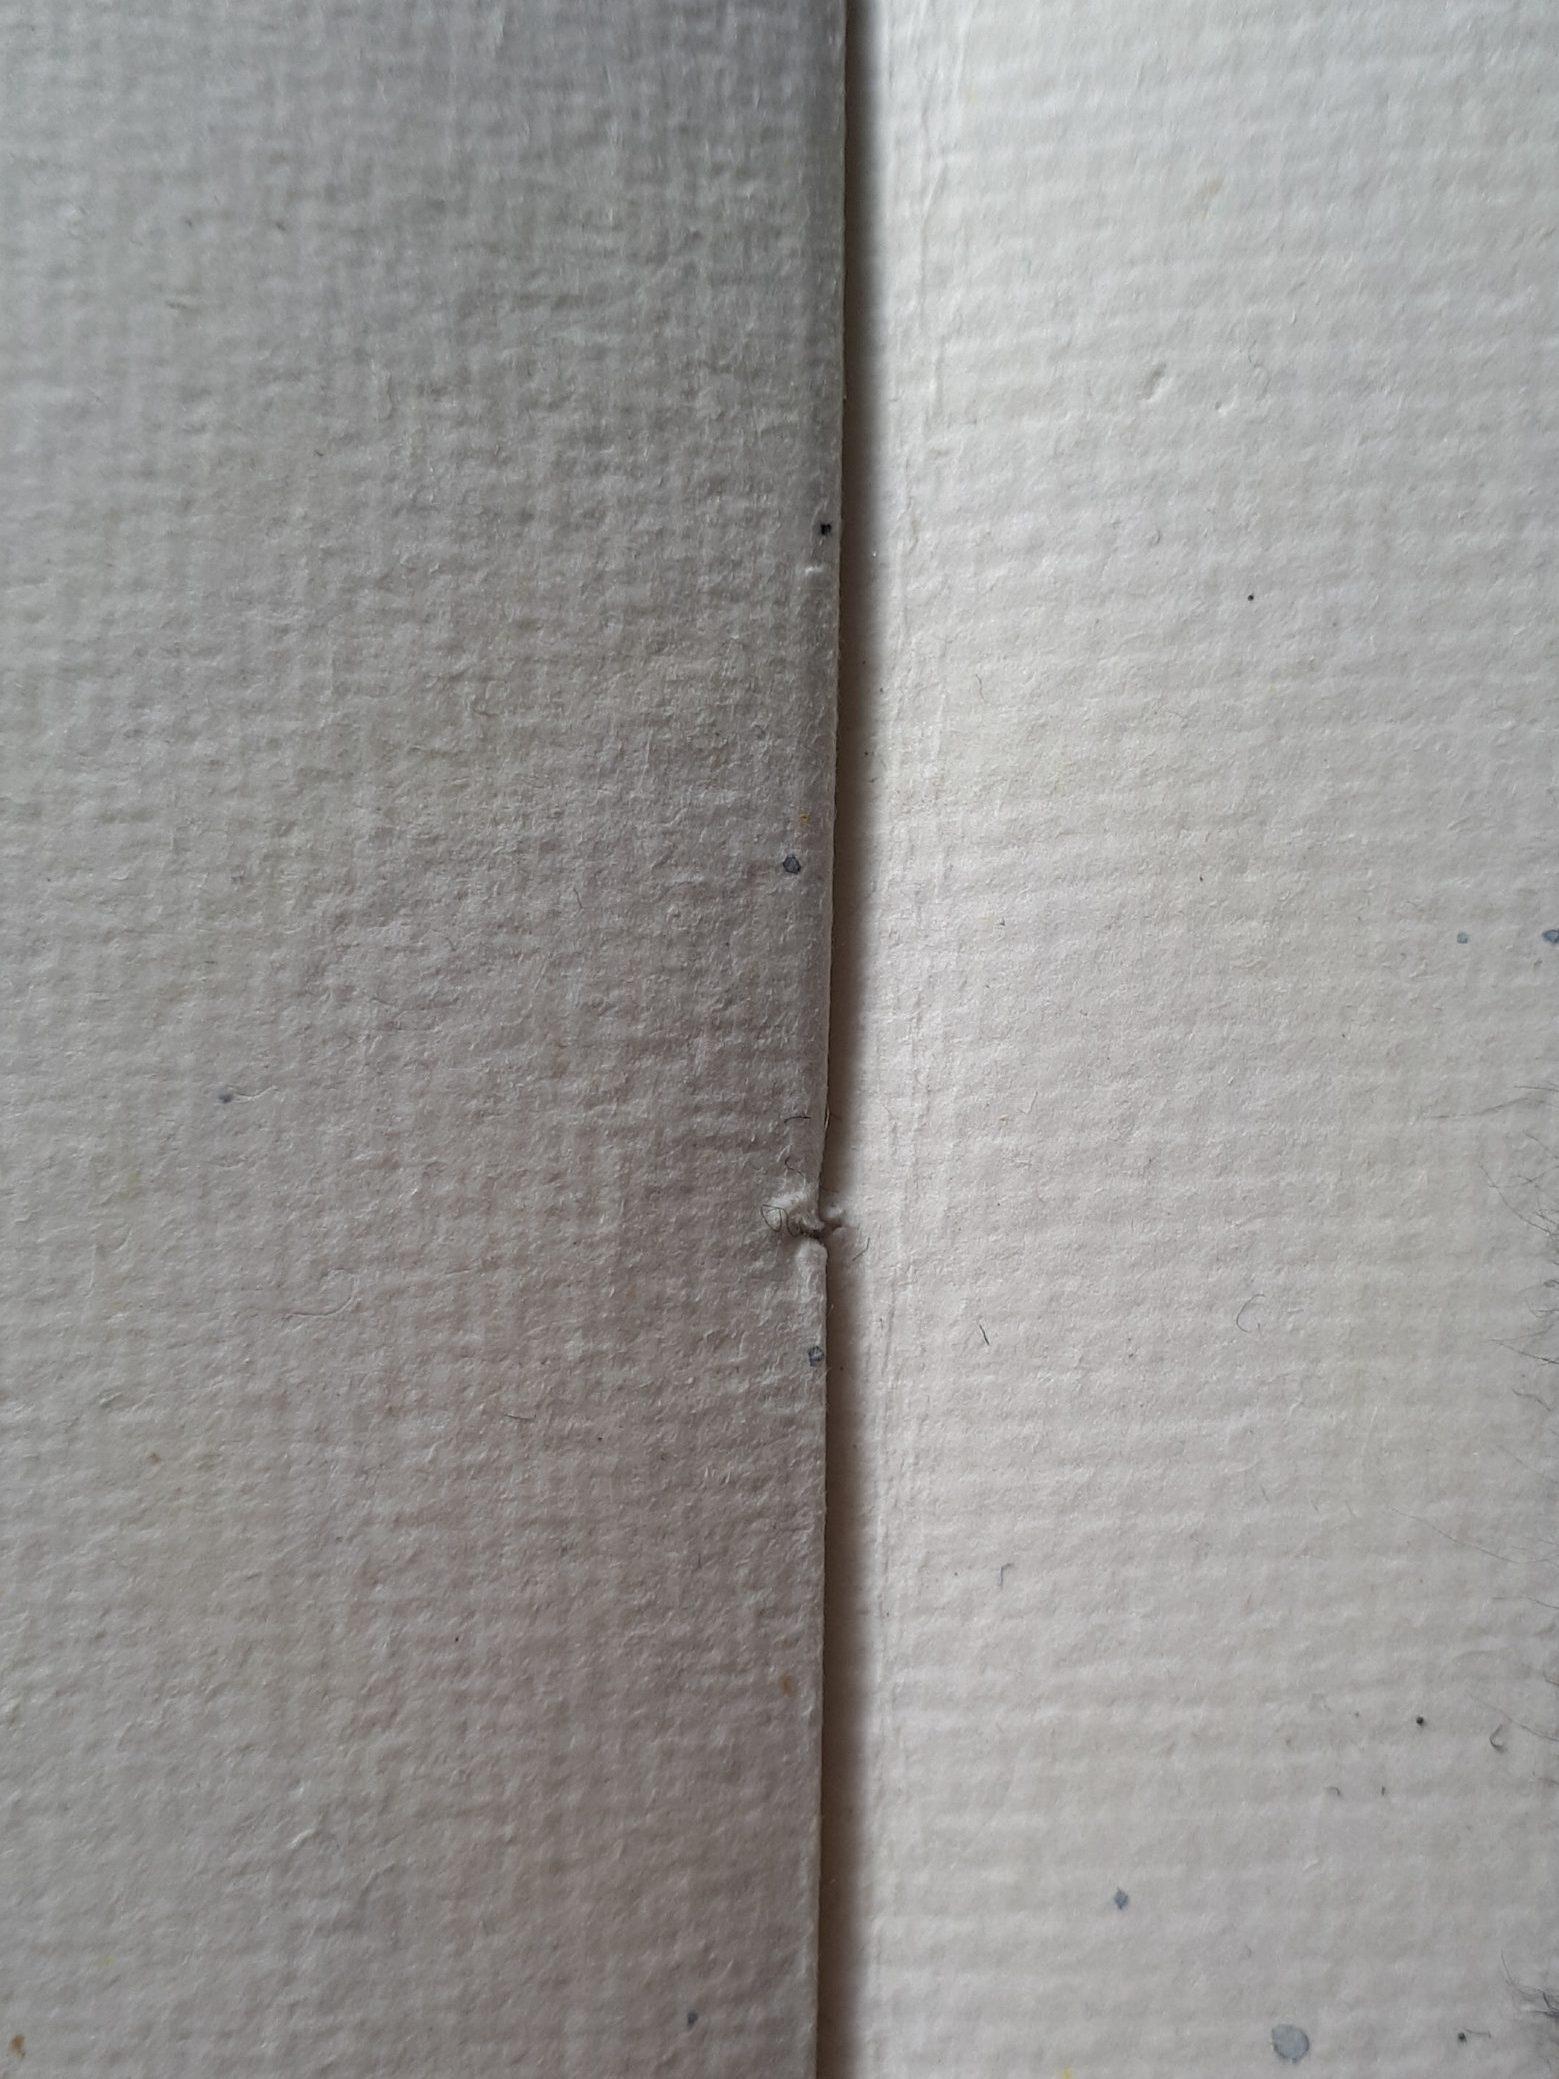 Khadi paper surface